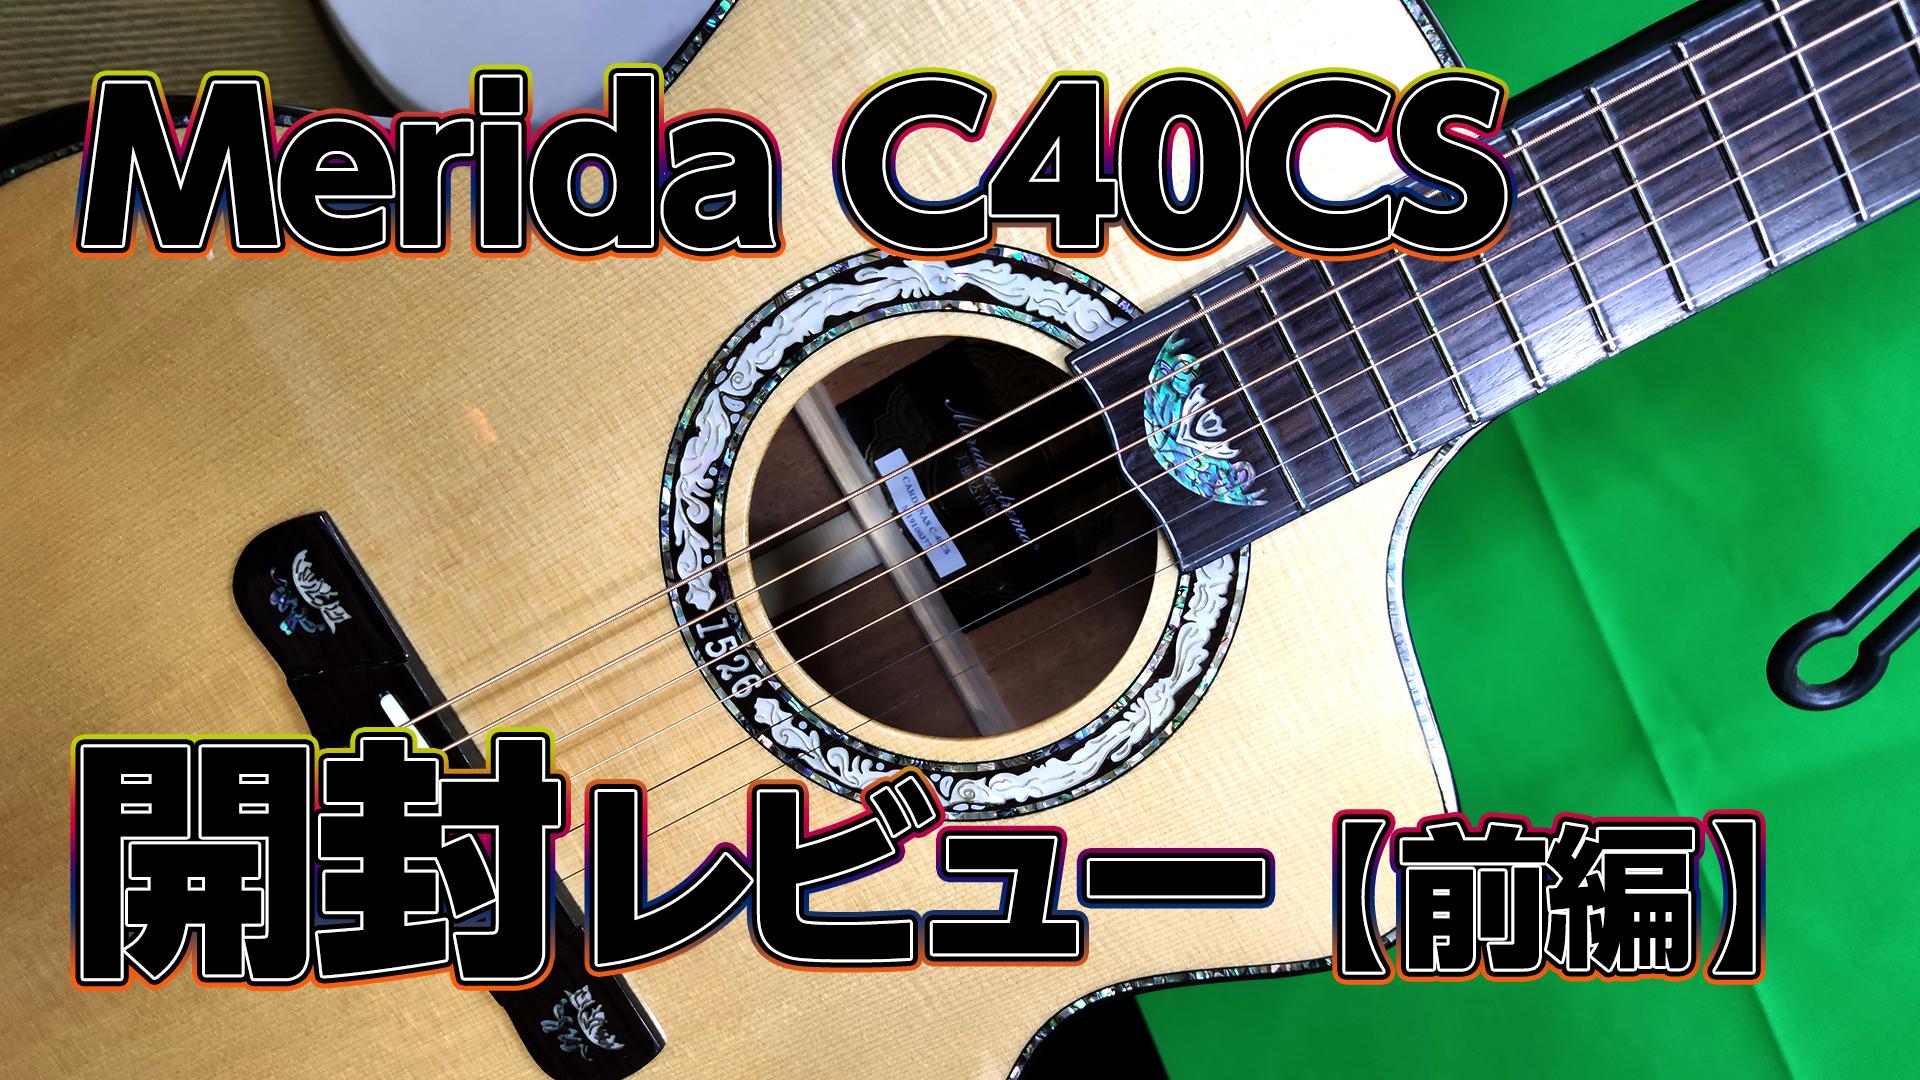 Merida C40CS 開封レビュー【前編】 - 中国製 単板アコースティックギター